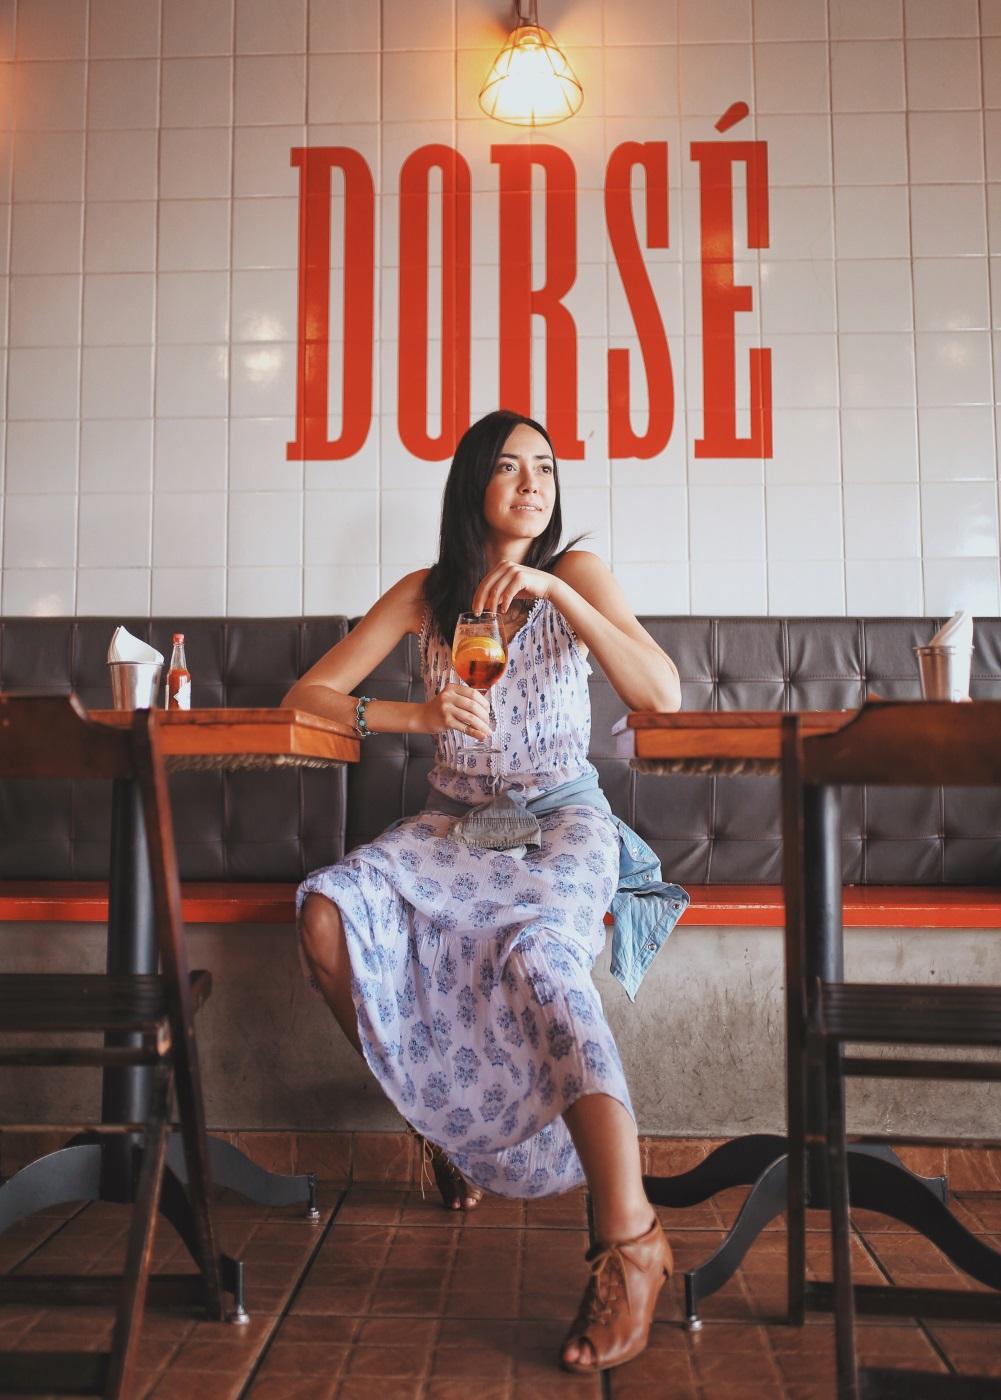 lifesthayle-restaurante-dorse-thayanna-sena-look.JPG